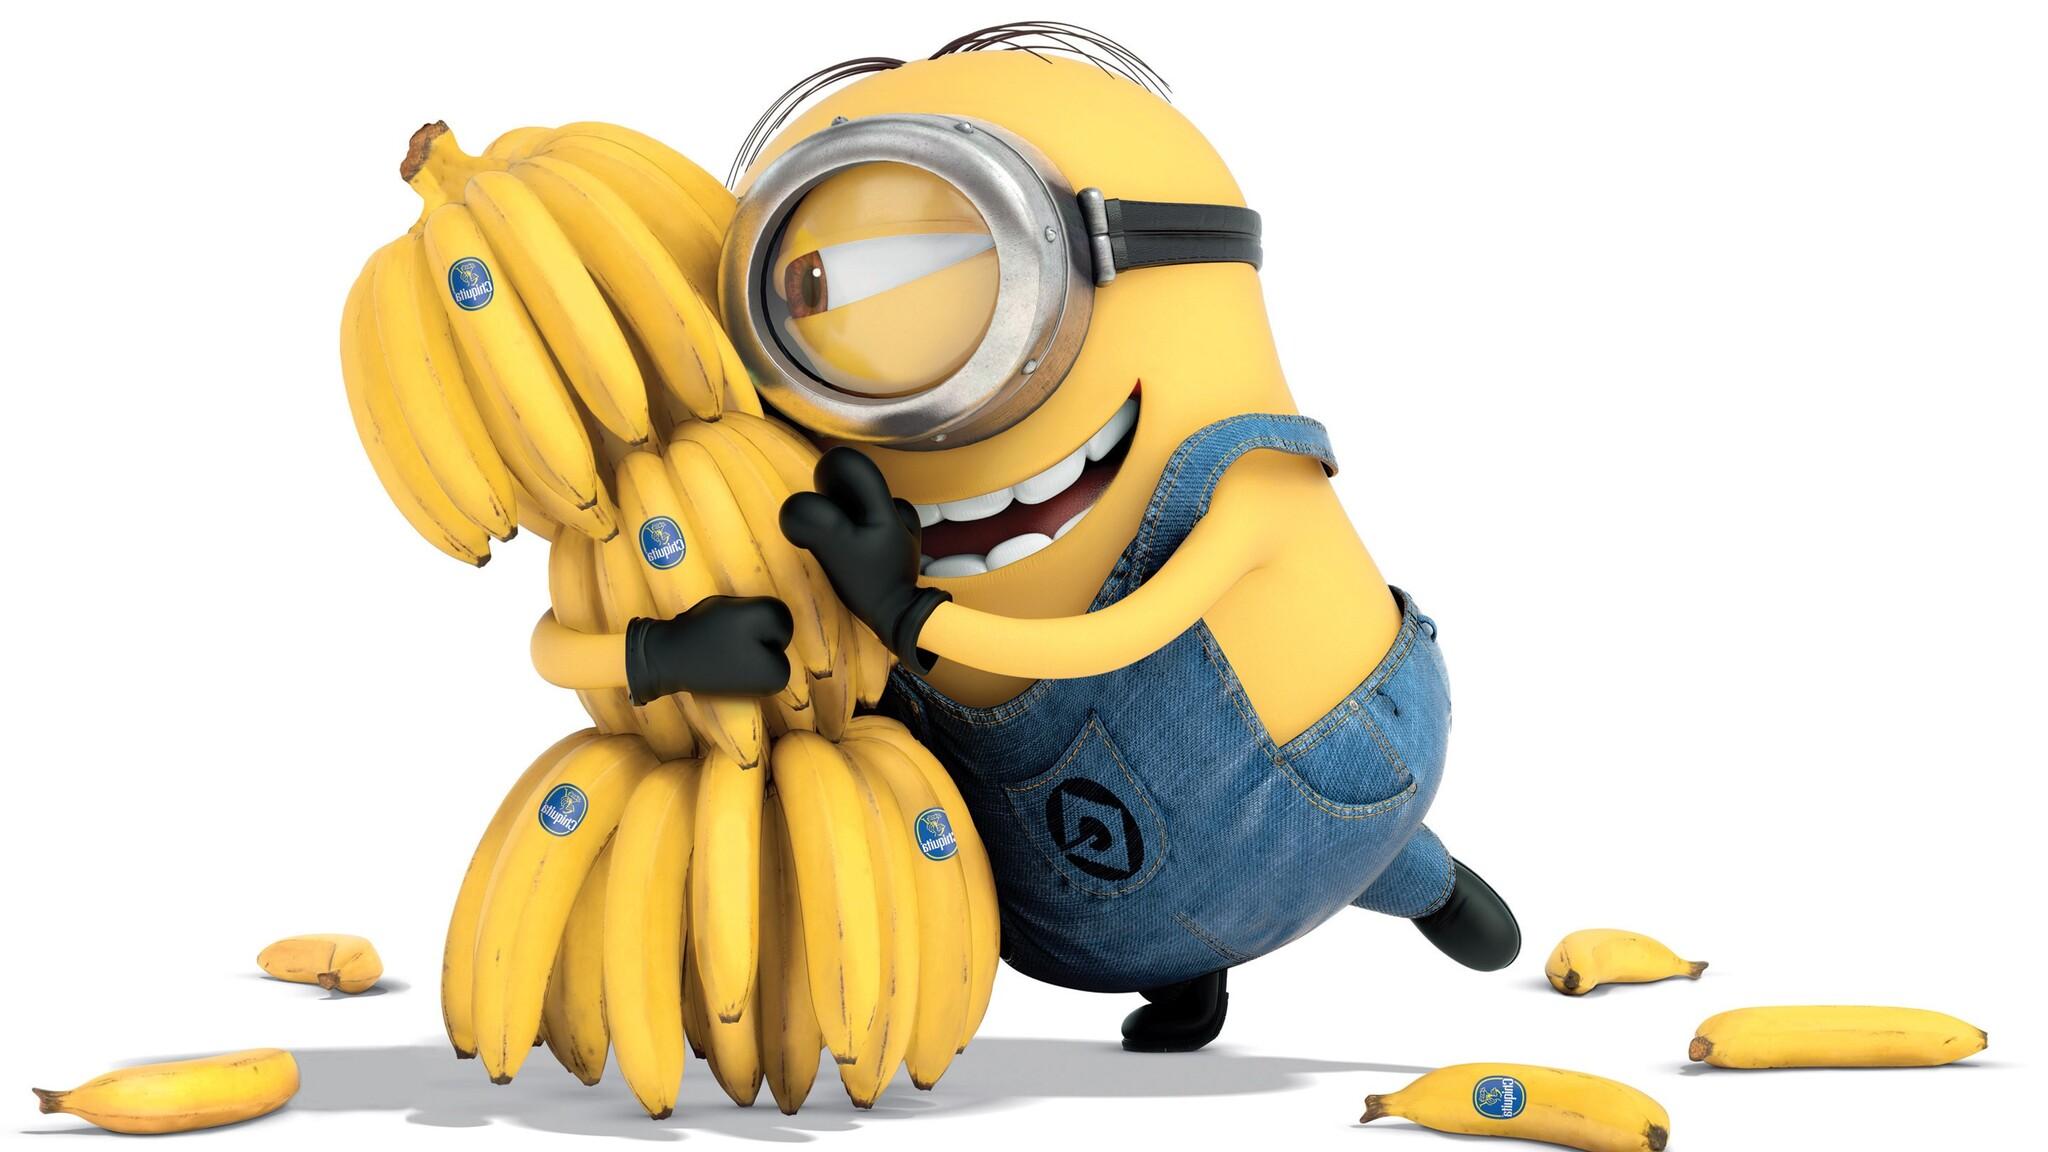 2048x1152 Minion Bananas 2048x1152 Resolution HD 4k